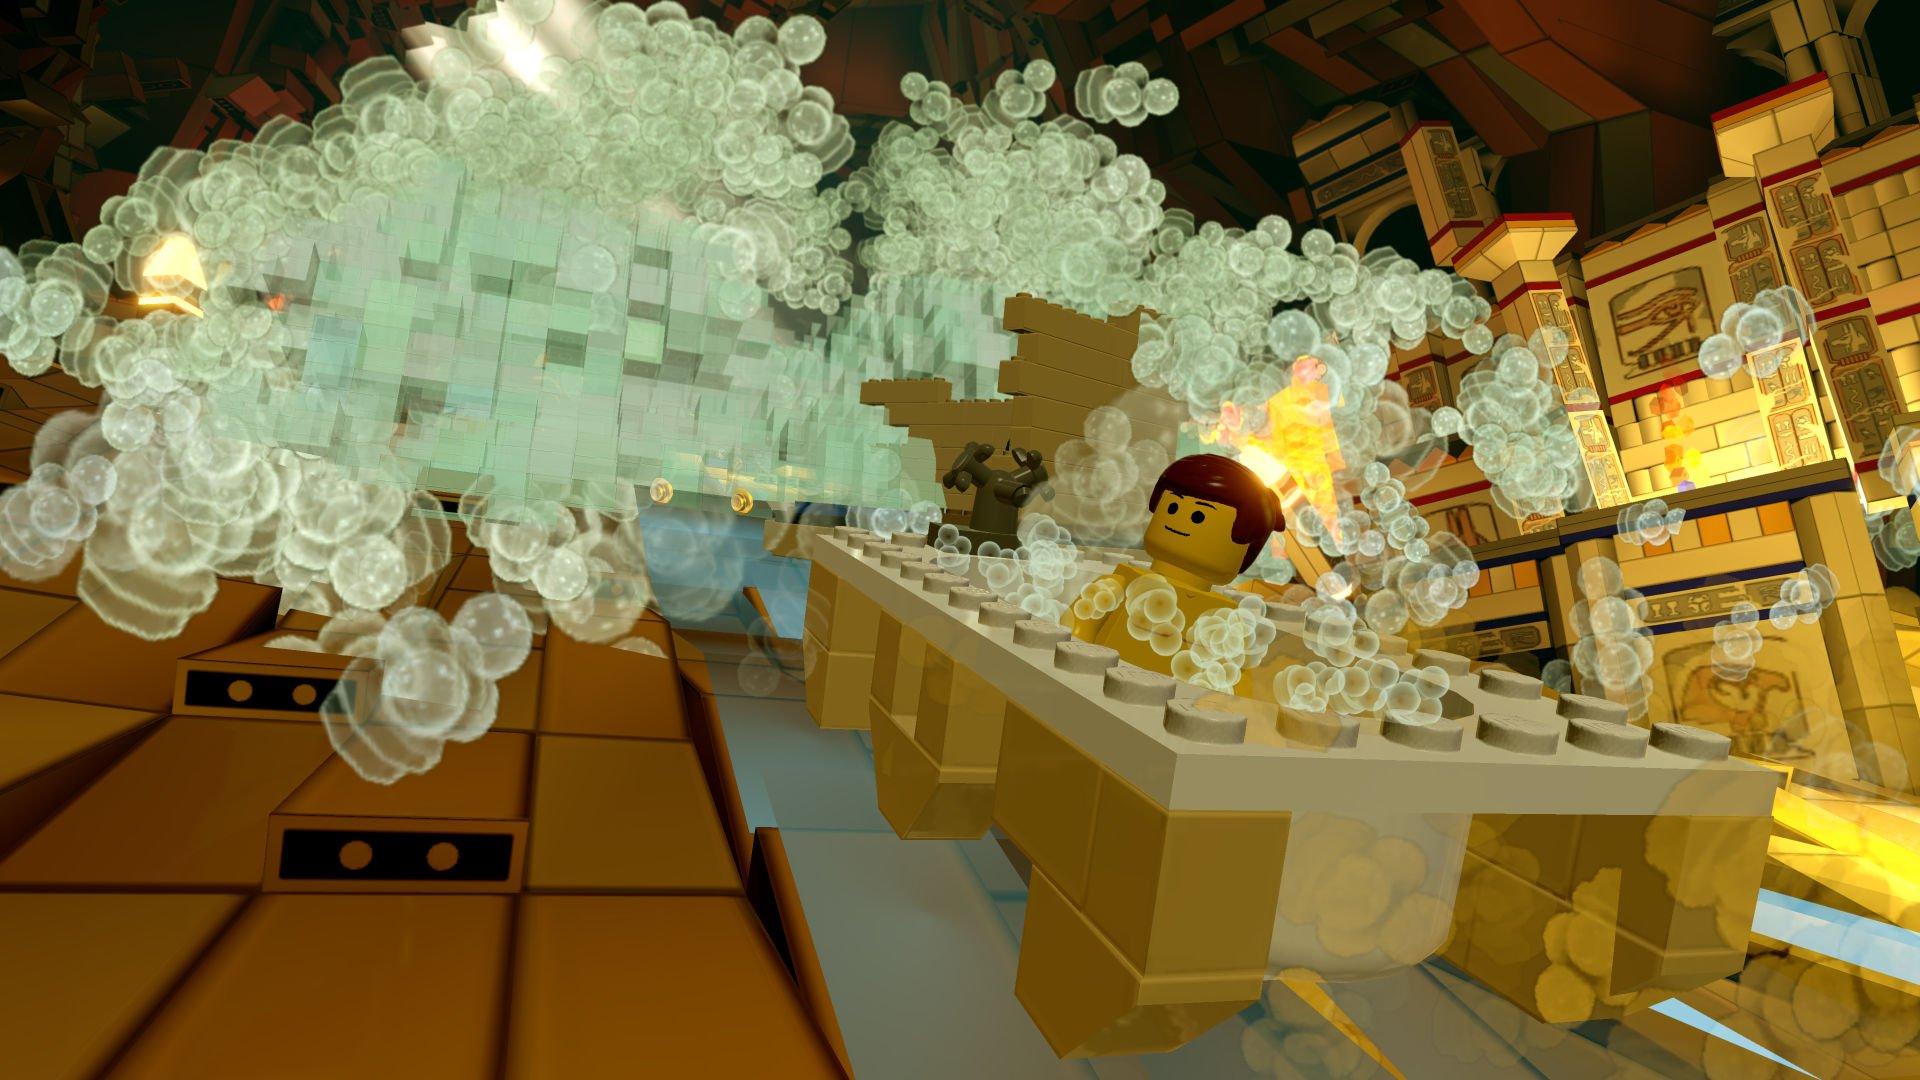 lego_movie_the_videogame-2456891.jpg